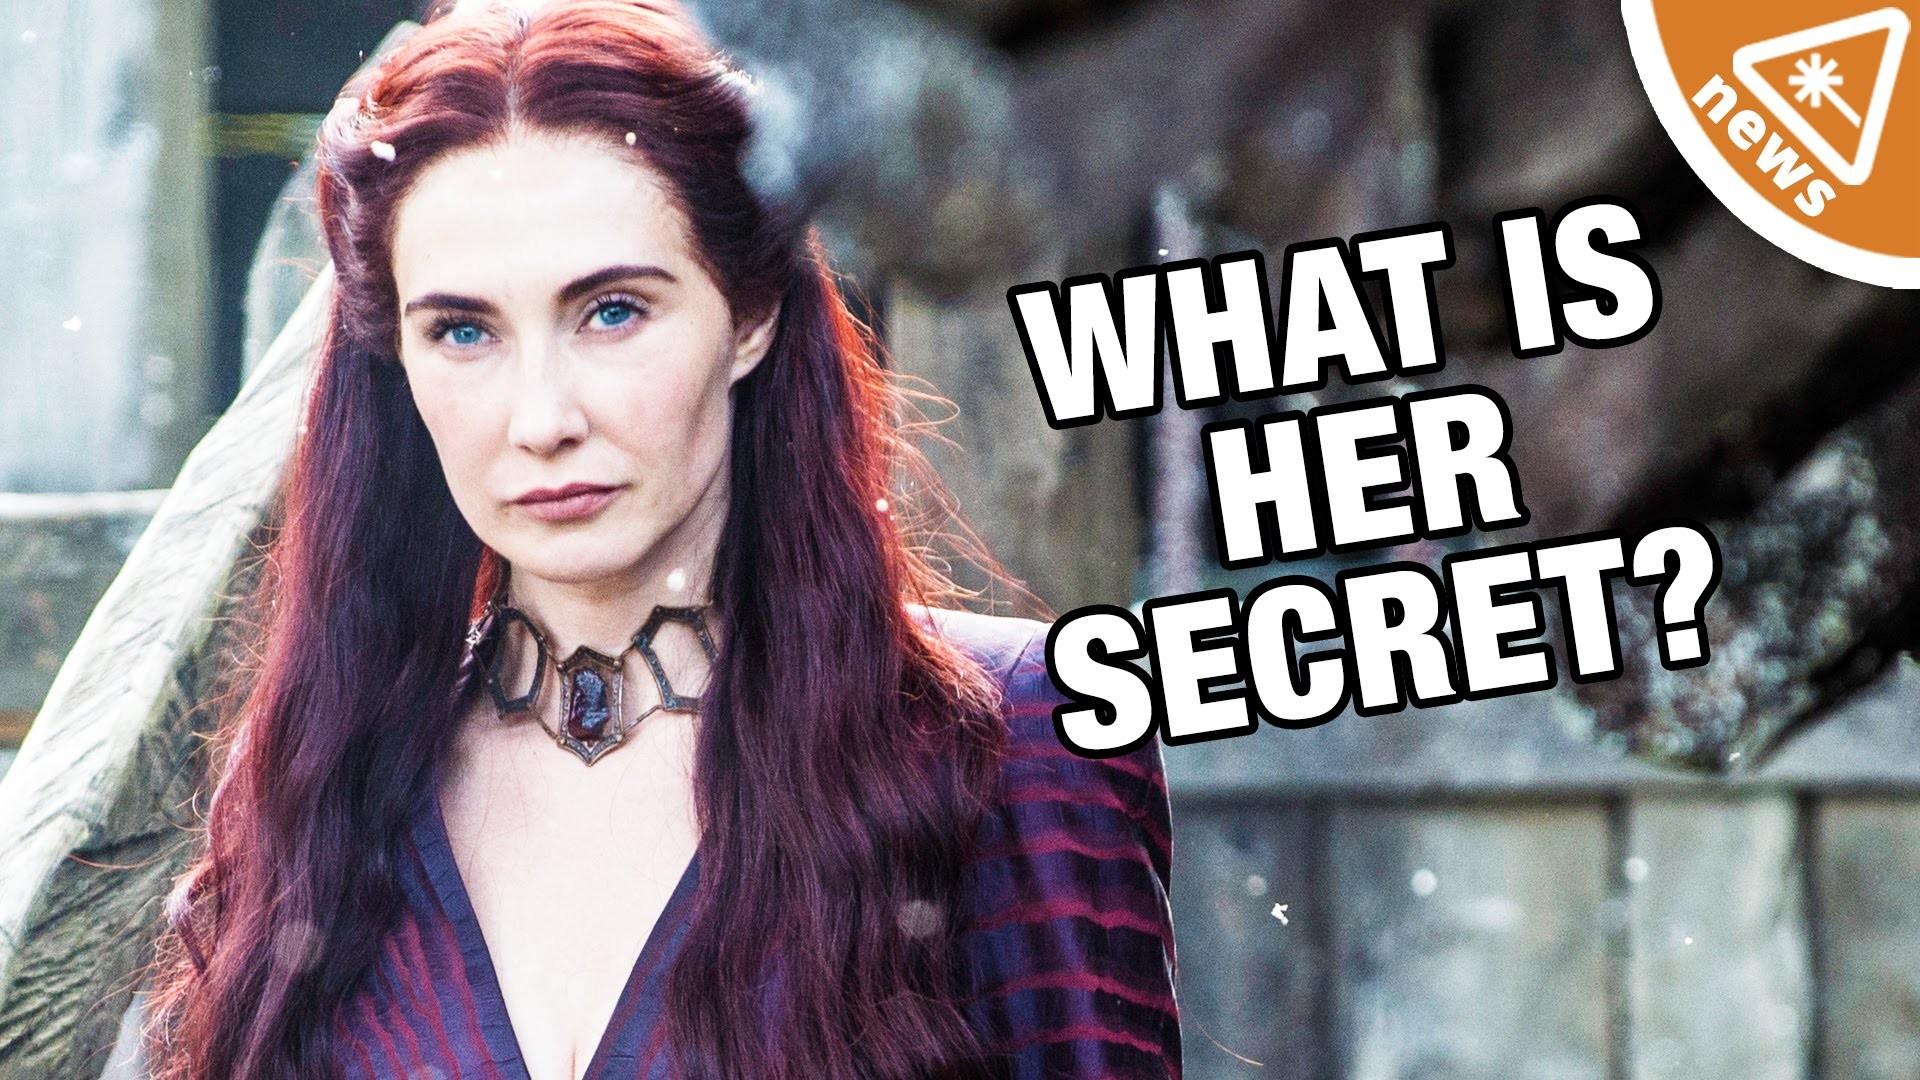 What is Melisandre's Big Secret in Game of Thrones? (Nerdist News w/ Jessica  Chobot) – YouTube